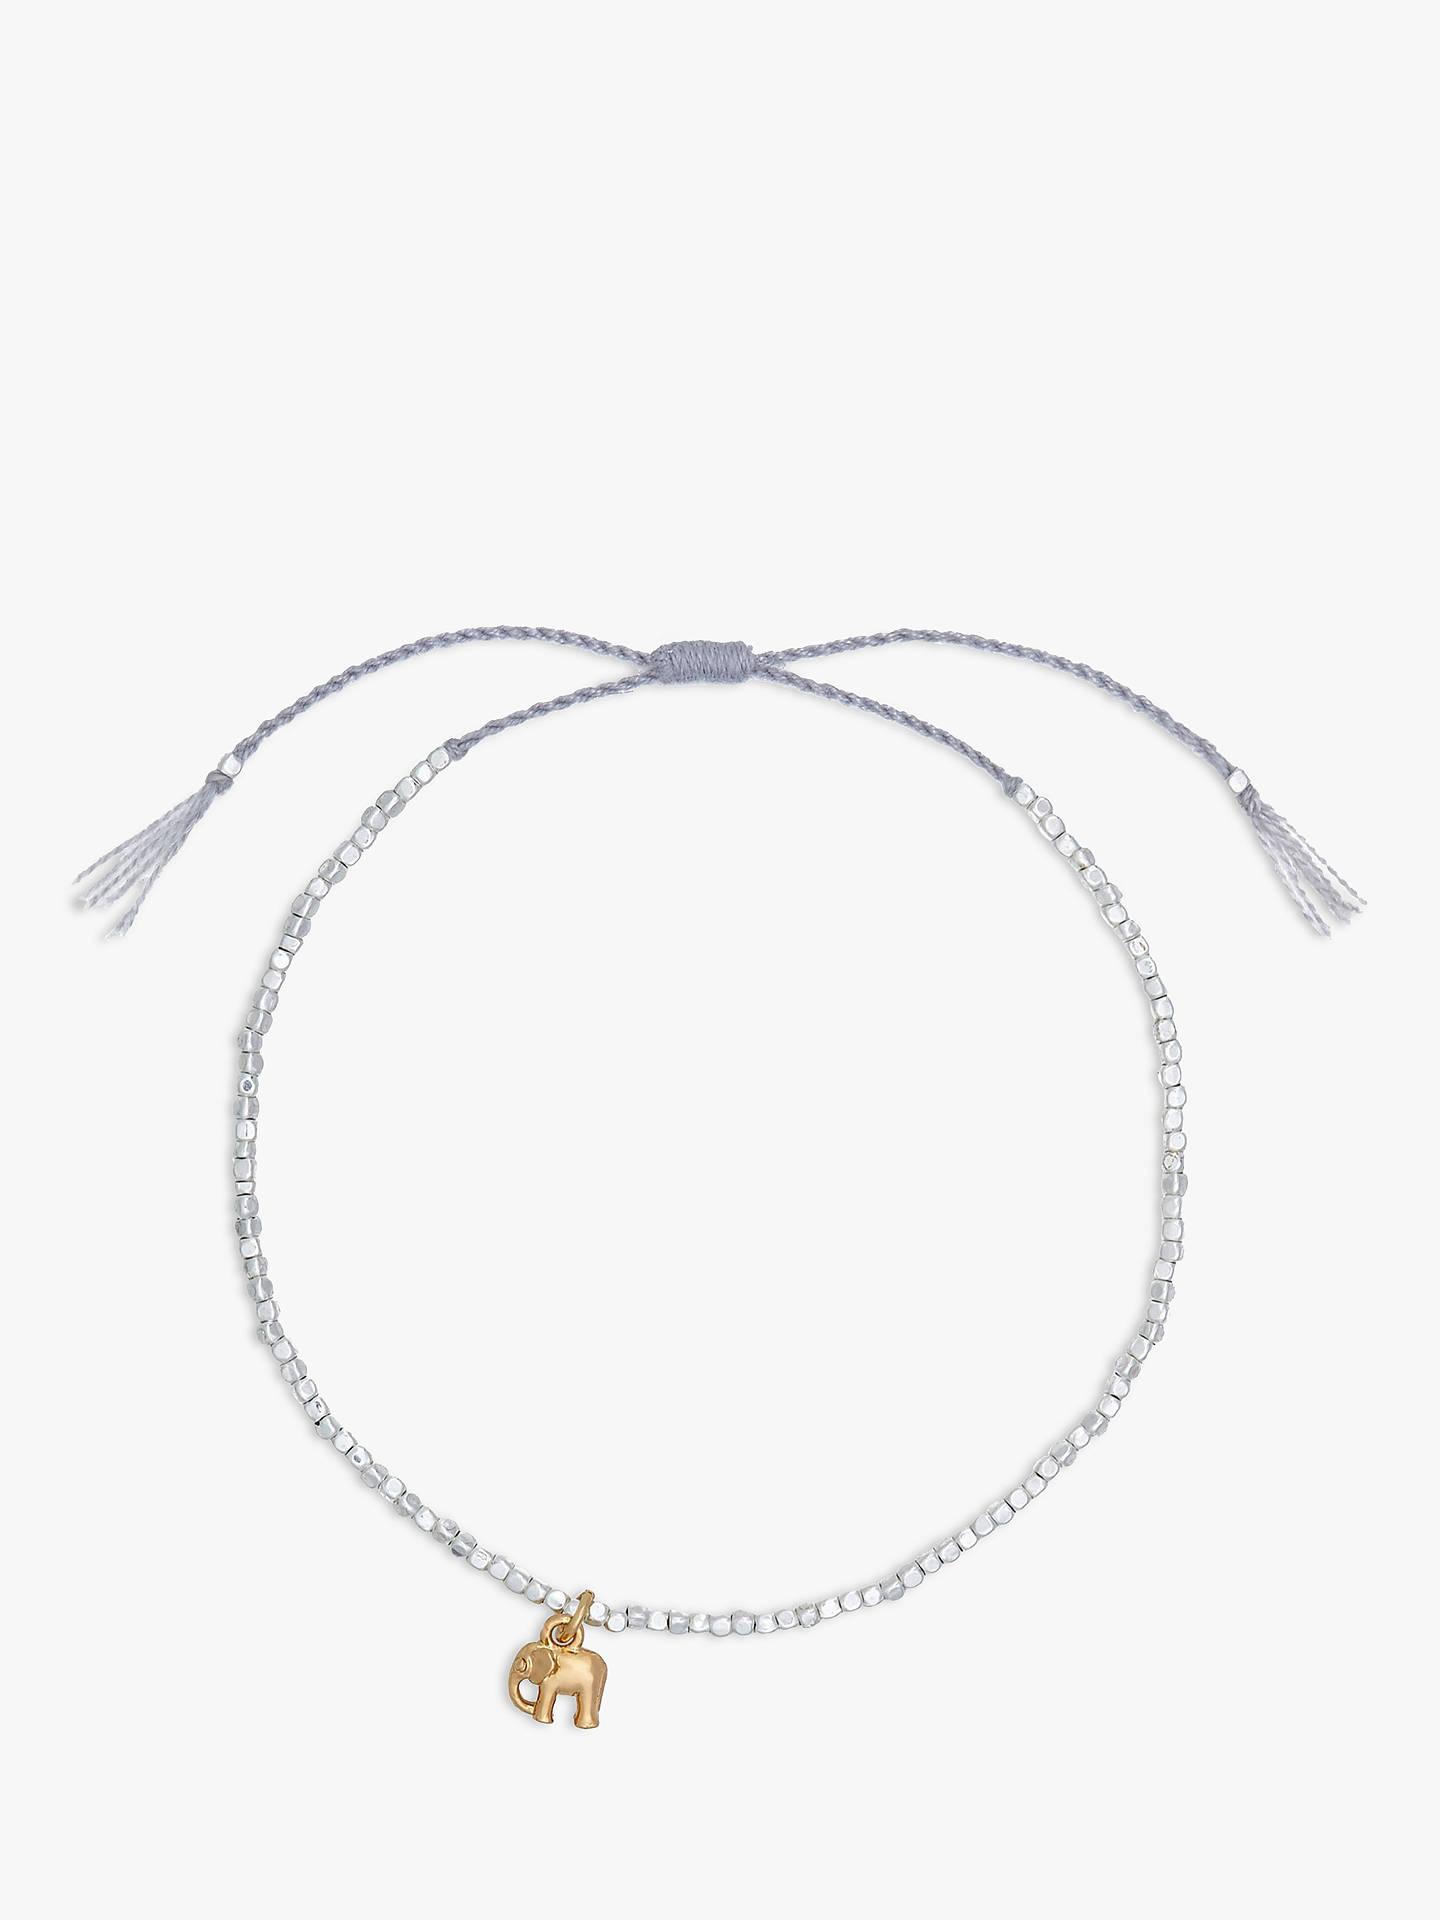 Estella Bartlett Louise Elephant Charm Bracelet Silver Gold Online At Johnlewis